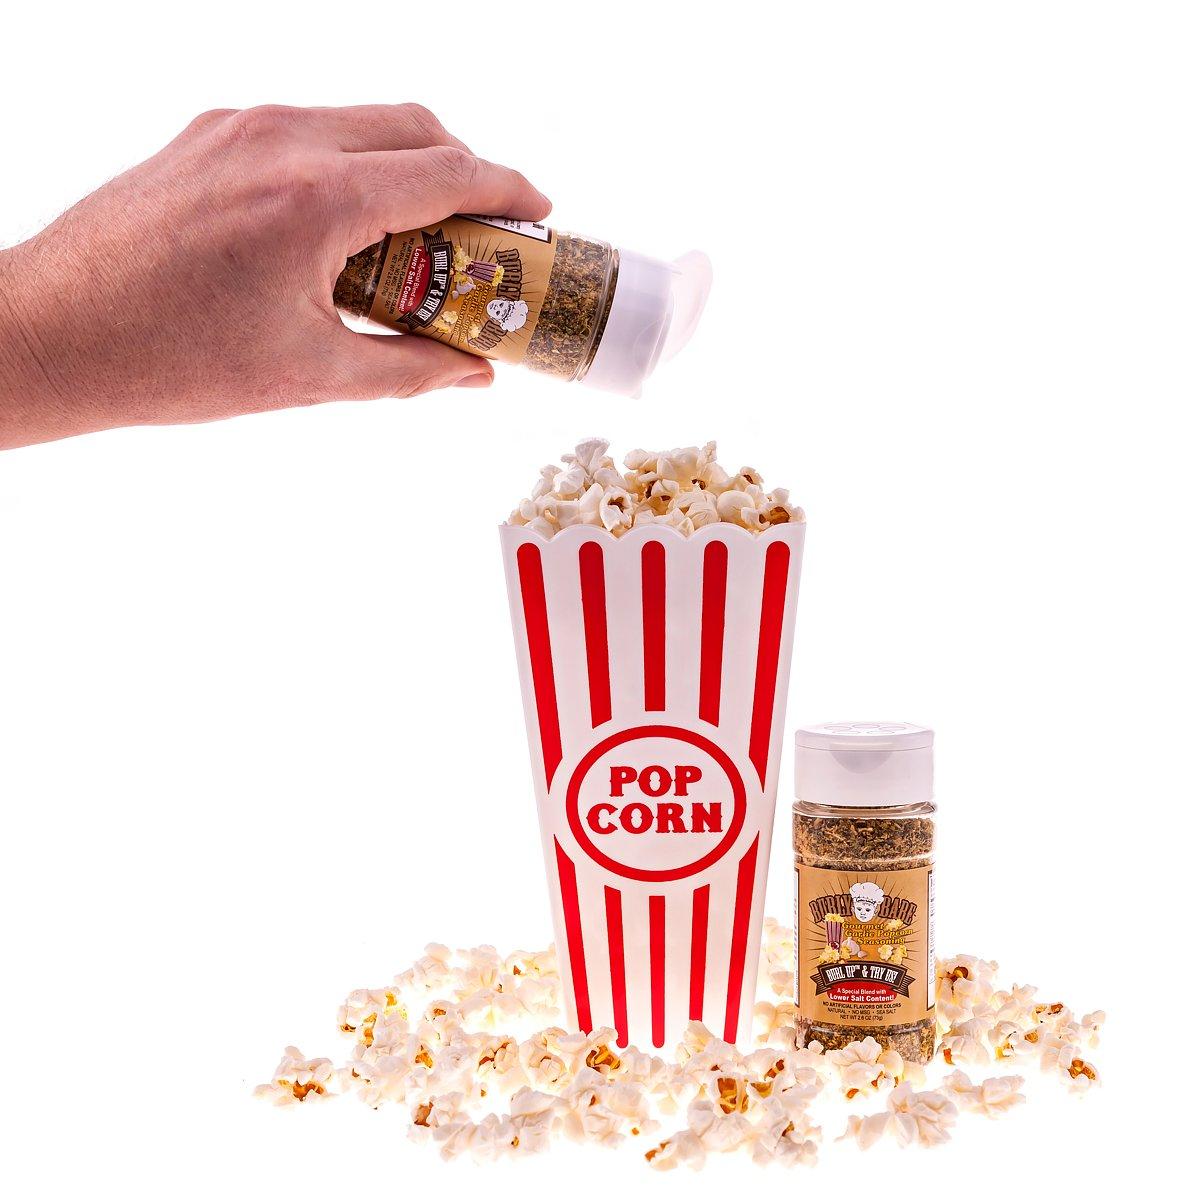 Burly Babe Gourmet Garlic Popcorn Seasonings (Pack of 3) NET WT 2.6 OZ (73g) each with Lower Salt Content